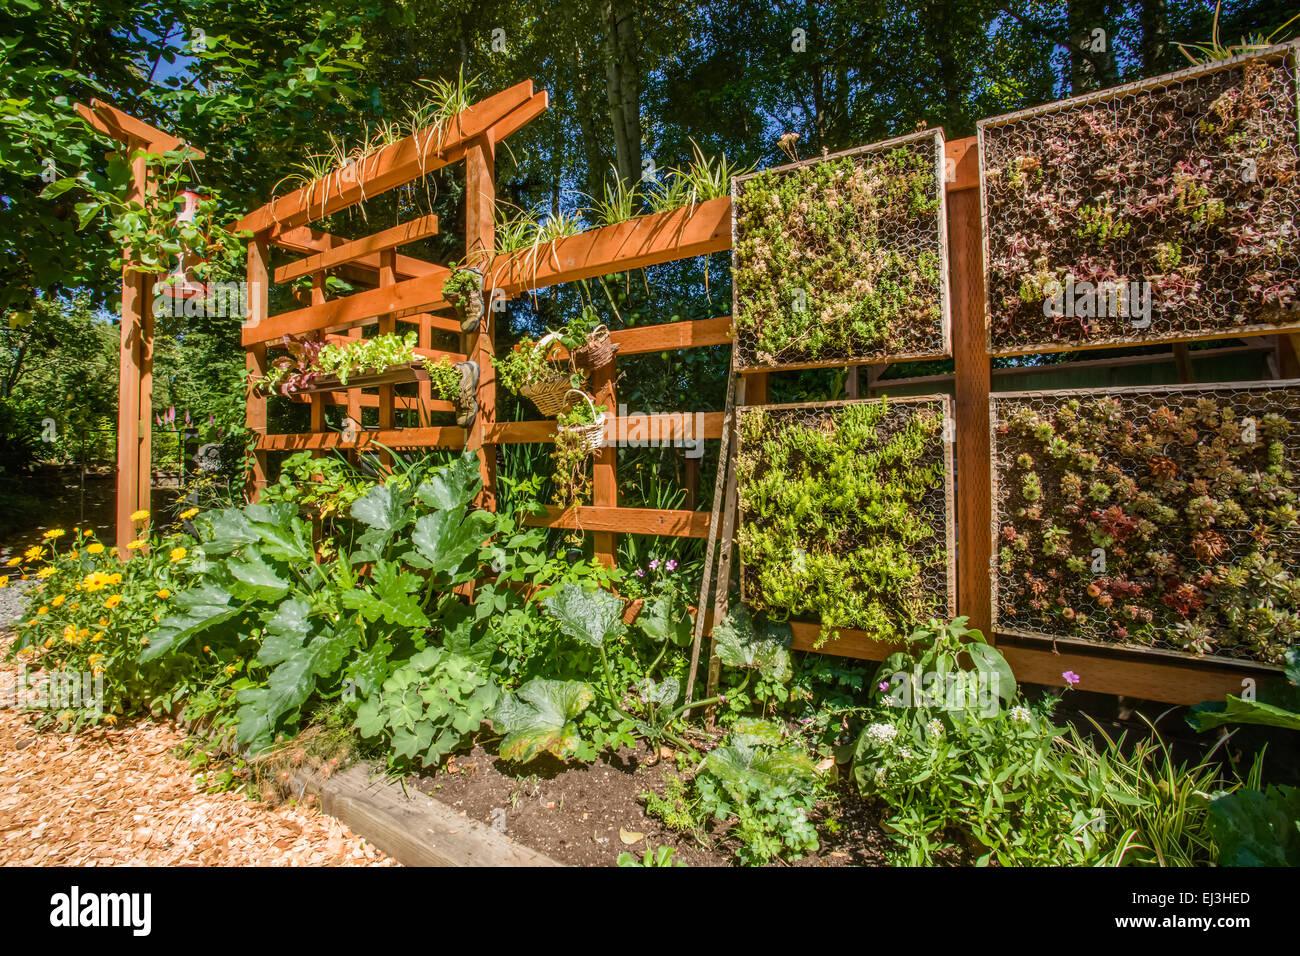 Vertical Vegetable Garden Growing On A Beautiful Wooden